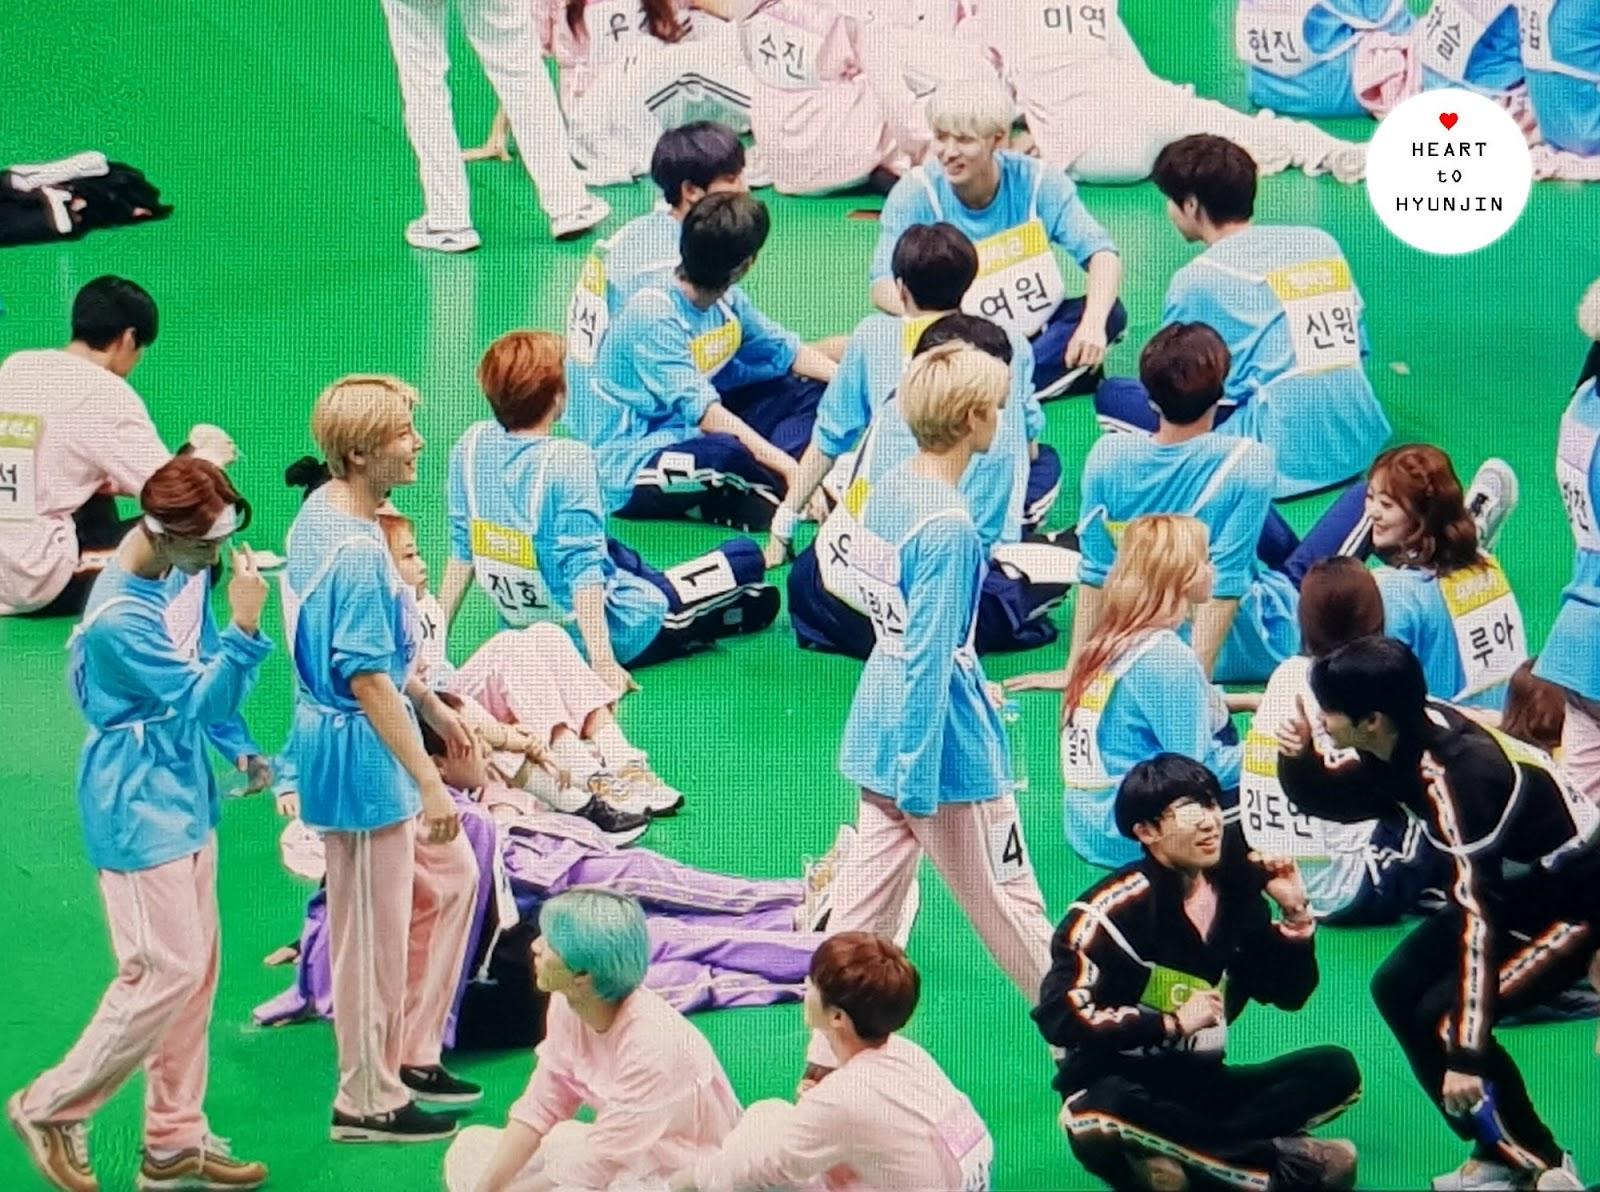 stray kids hyunjin cix bae jinyoung 1